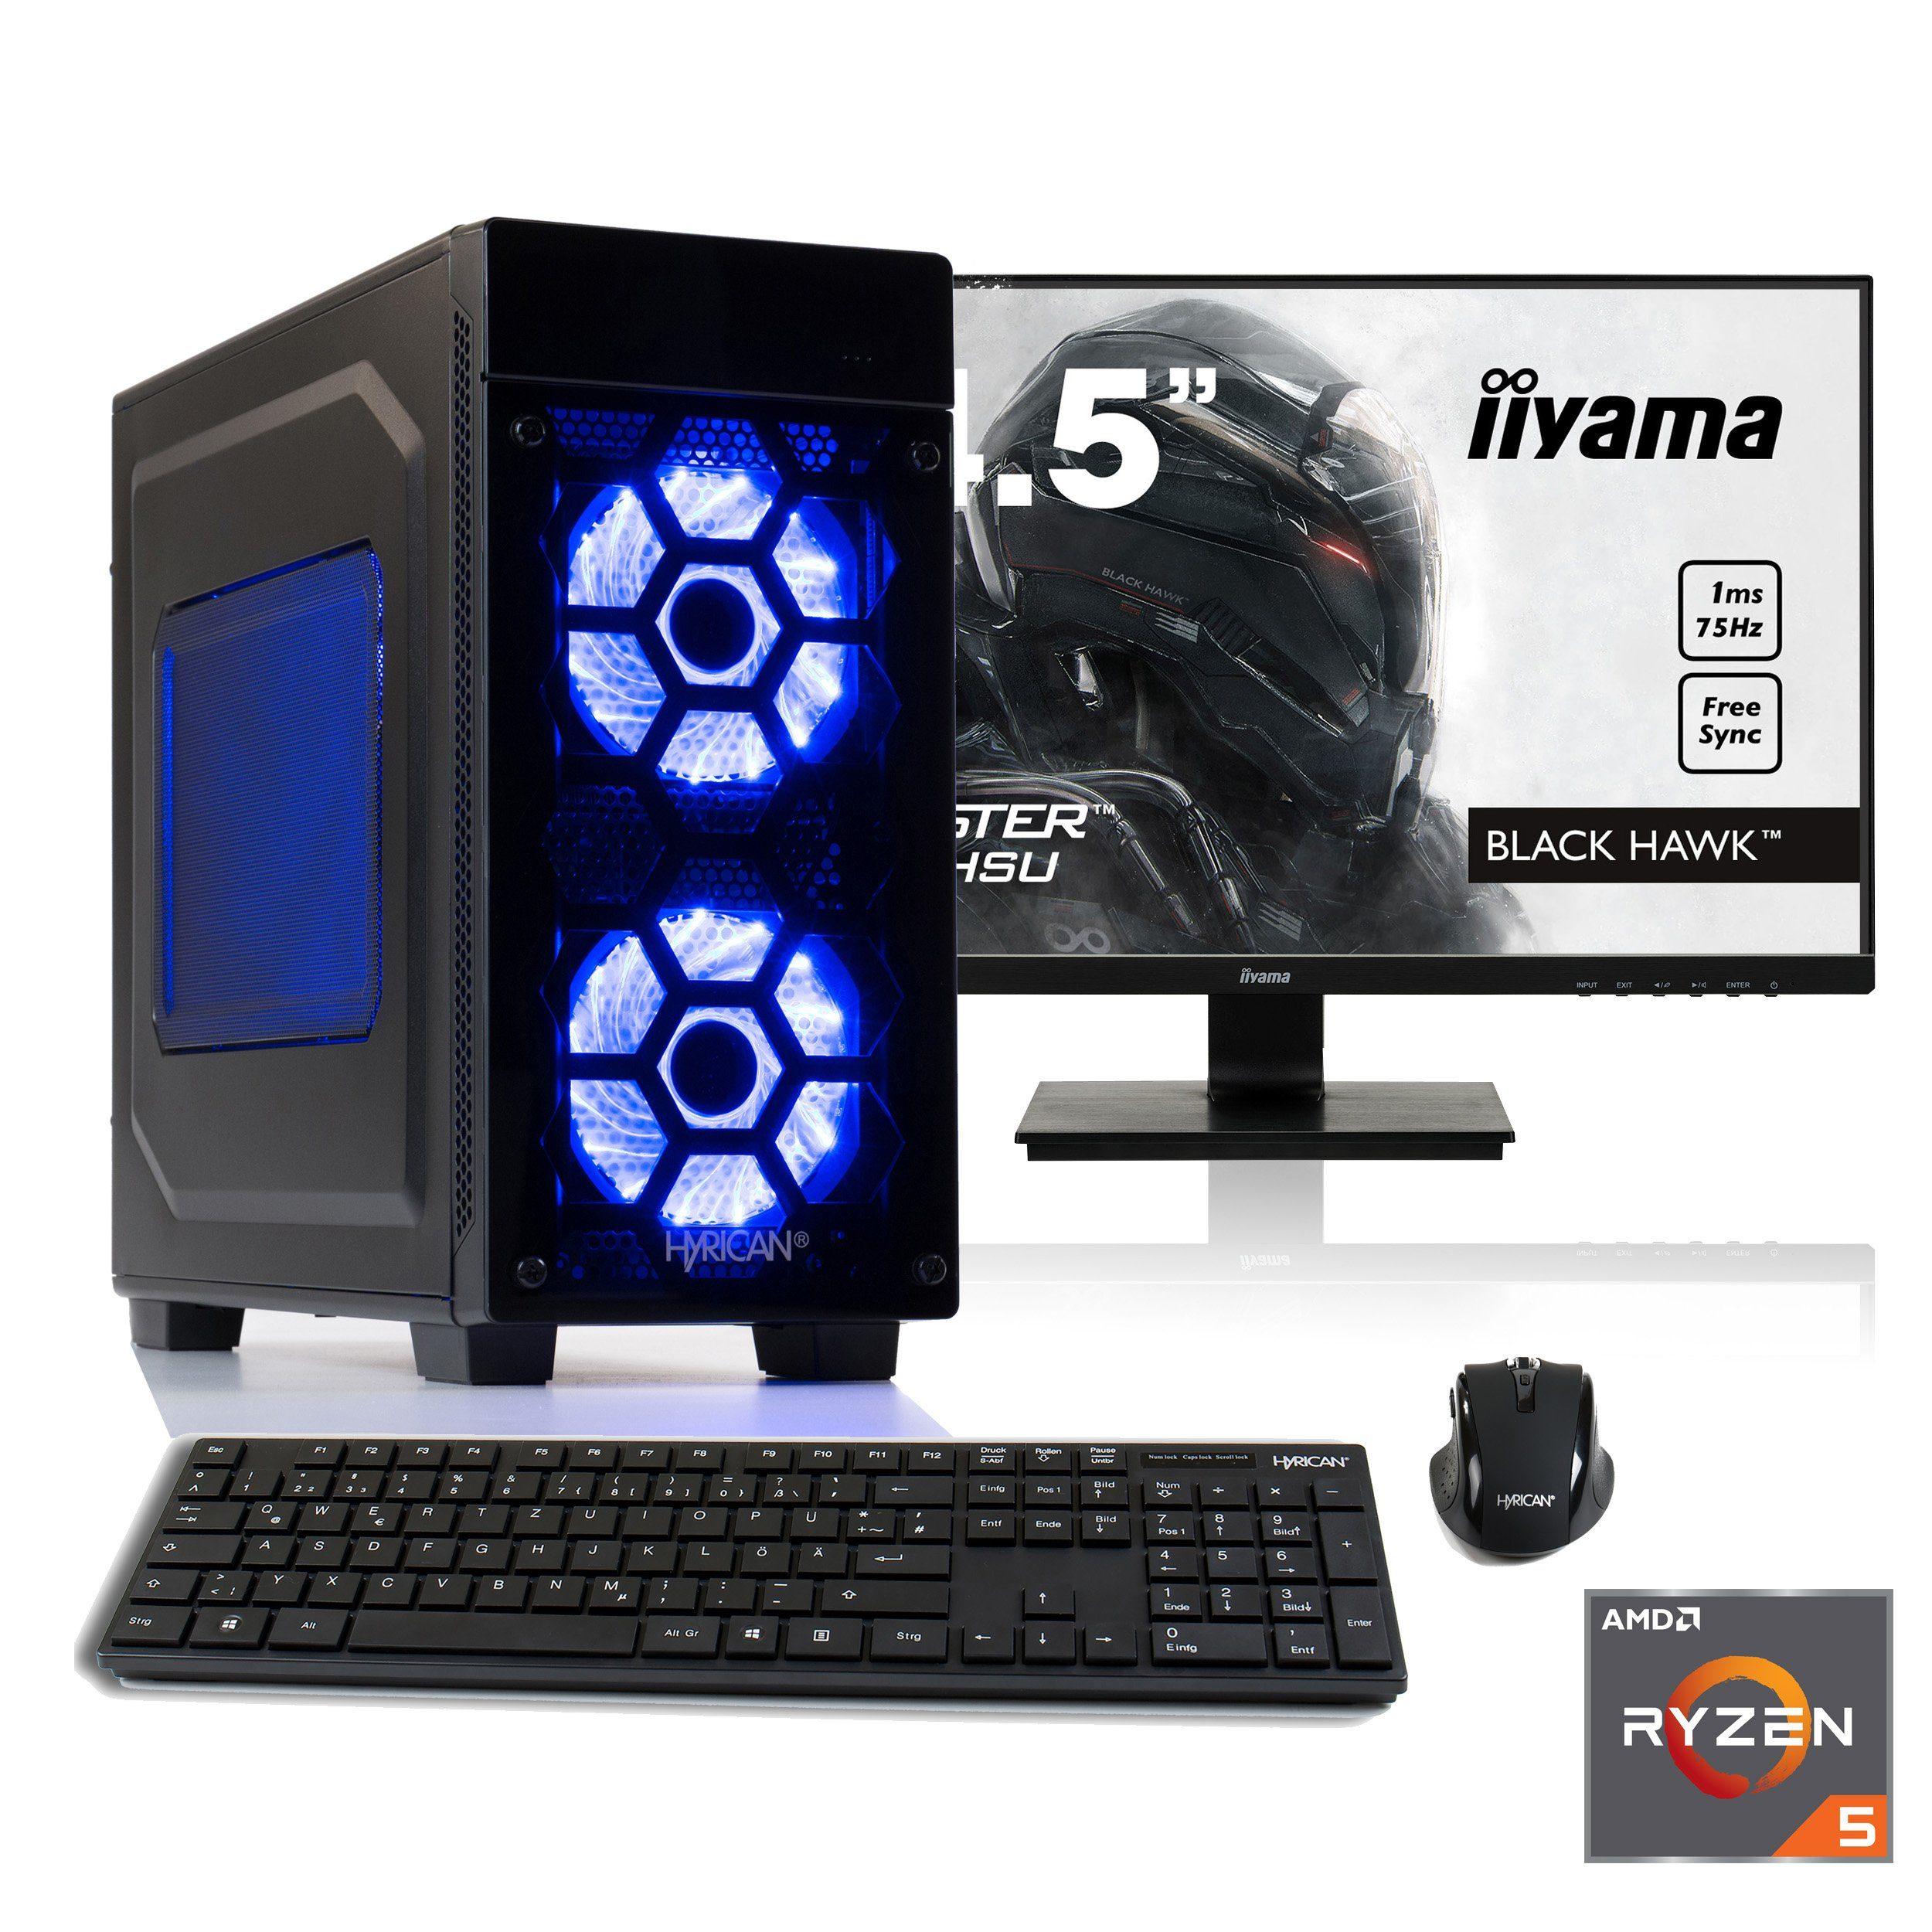 "HYRICAN Gaming PC Ryzen 5 2600, GTX 1050 Ti, 8GB RAM + 62,2cm (24"") TFT »Striker SET1712«"